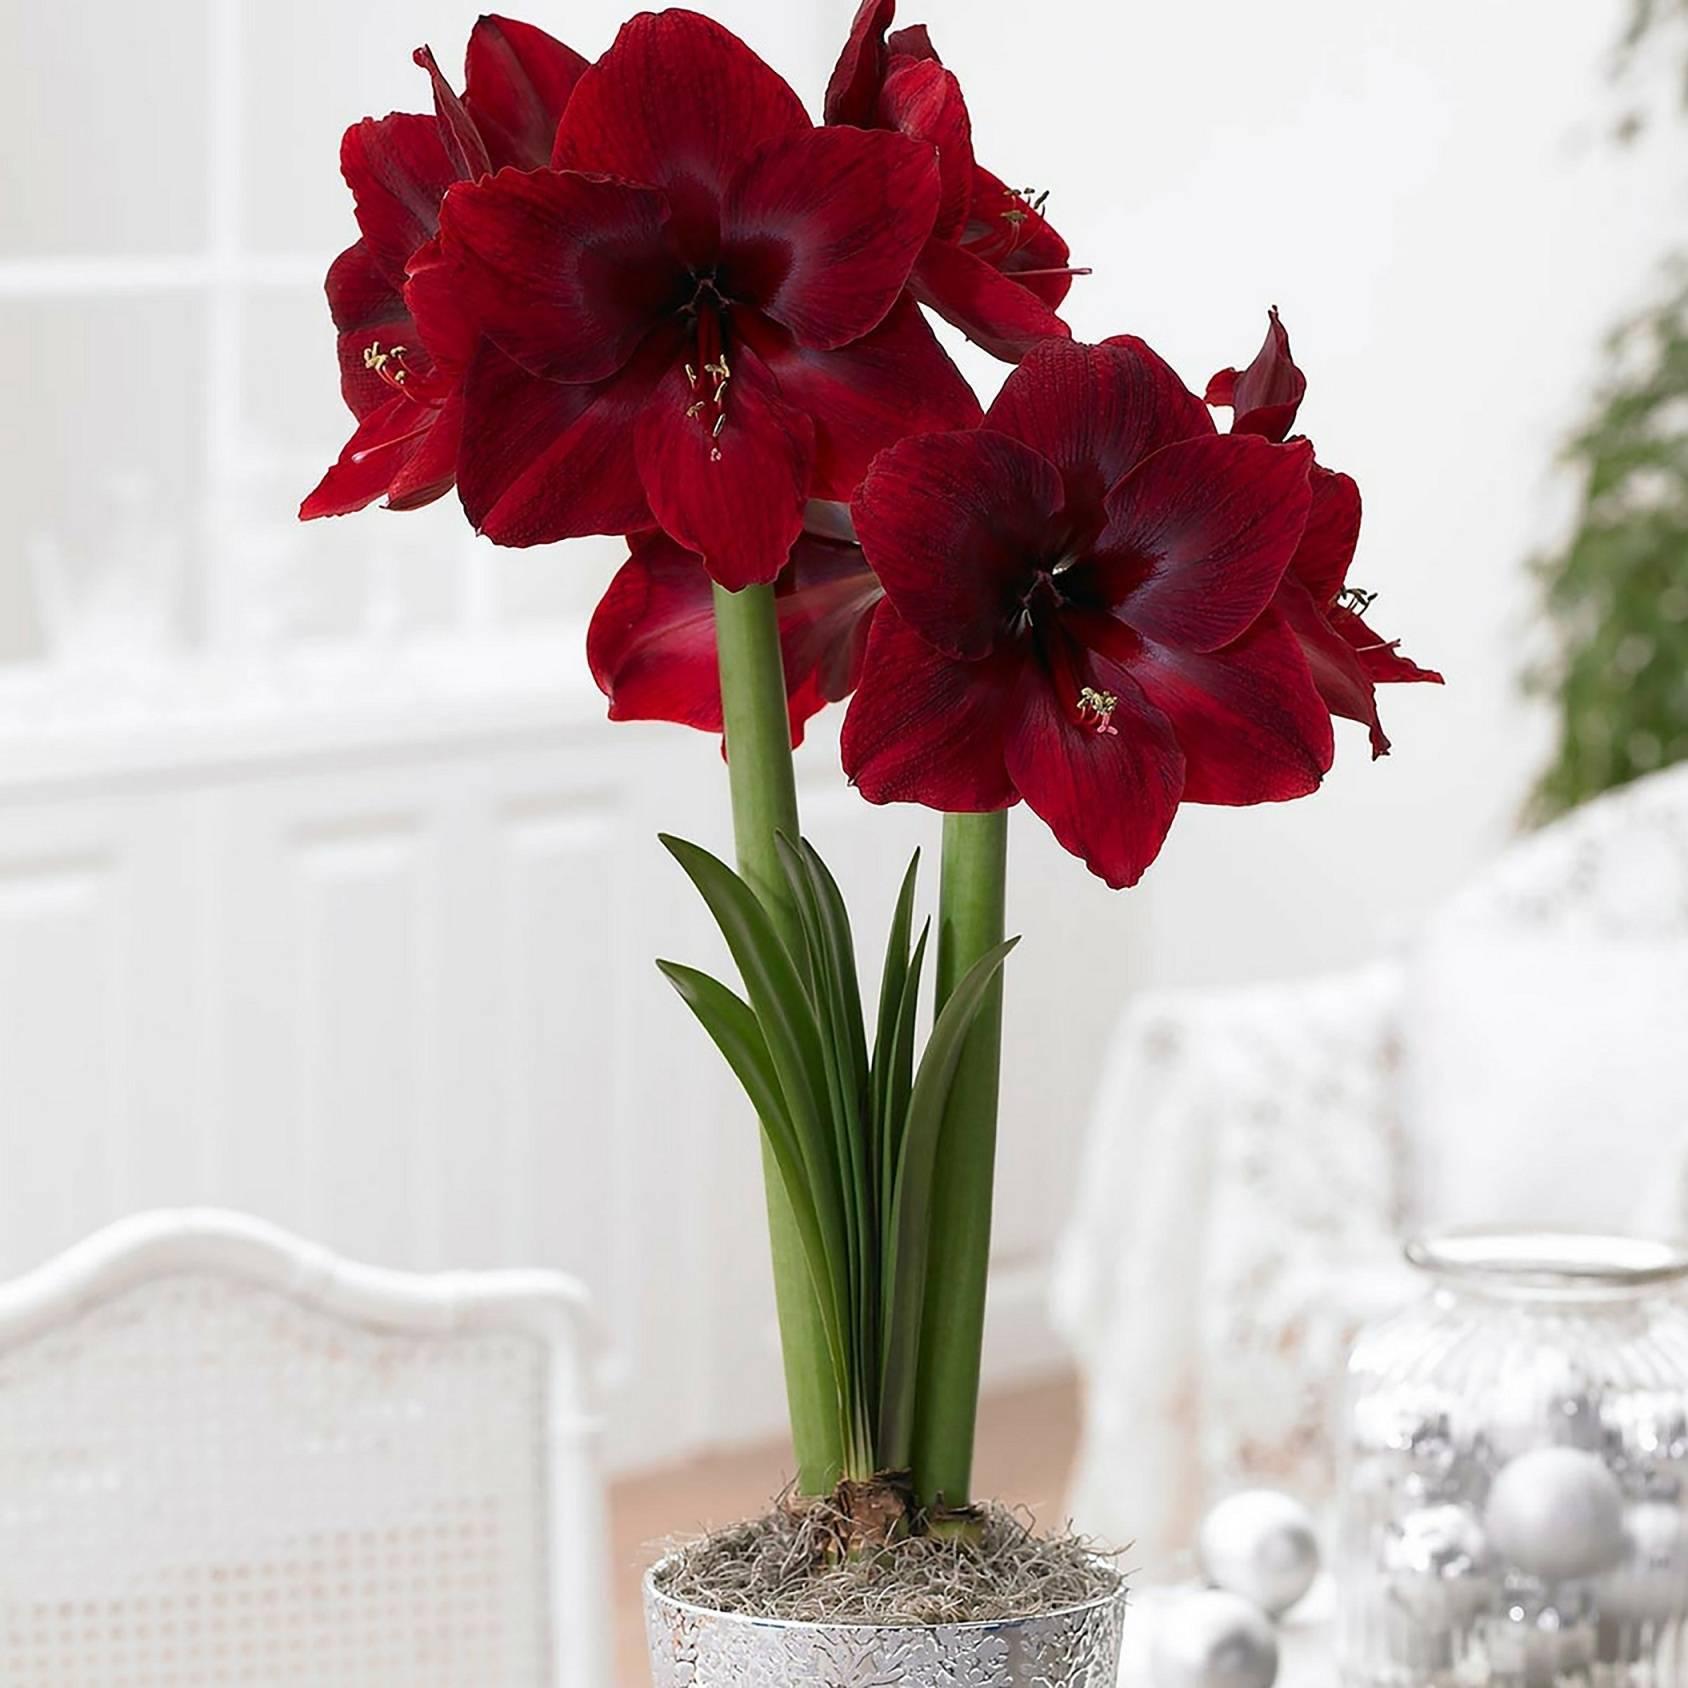 d5554489c831ebf802c4_Amaryllis_Red_Pearl_photocredit_Longfield_Gardens.jpg